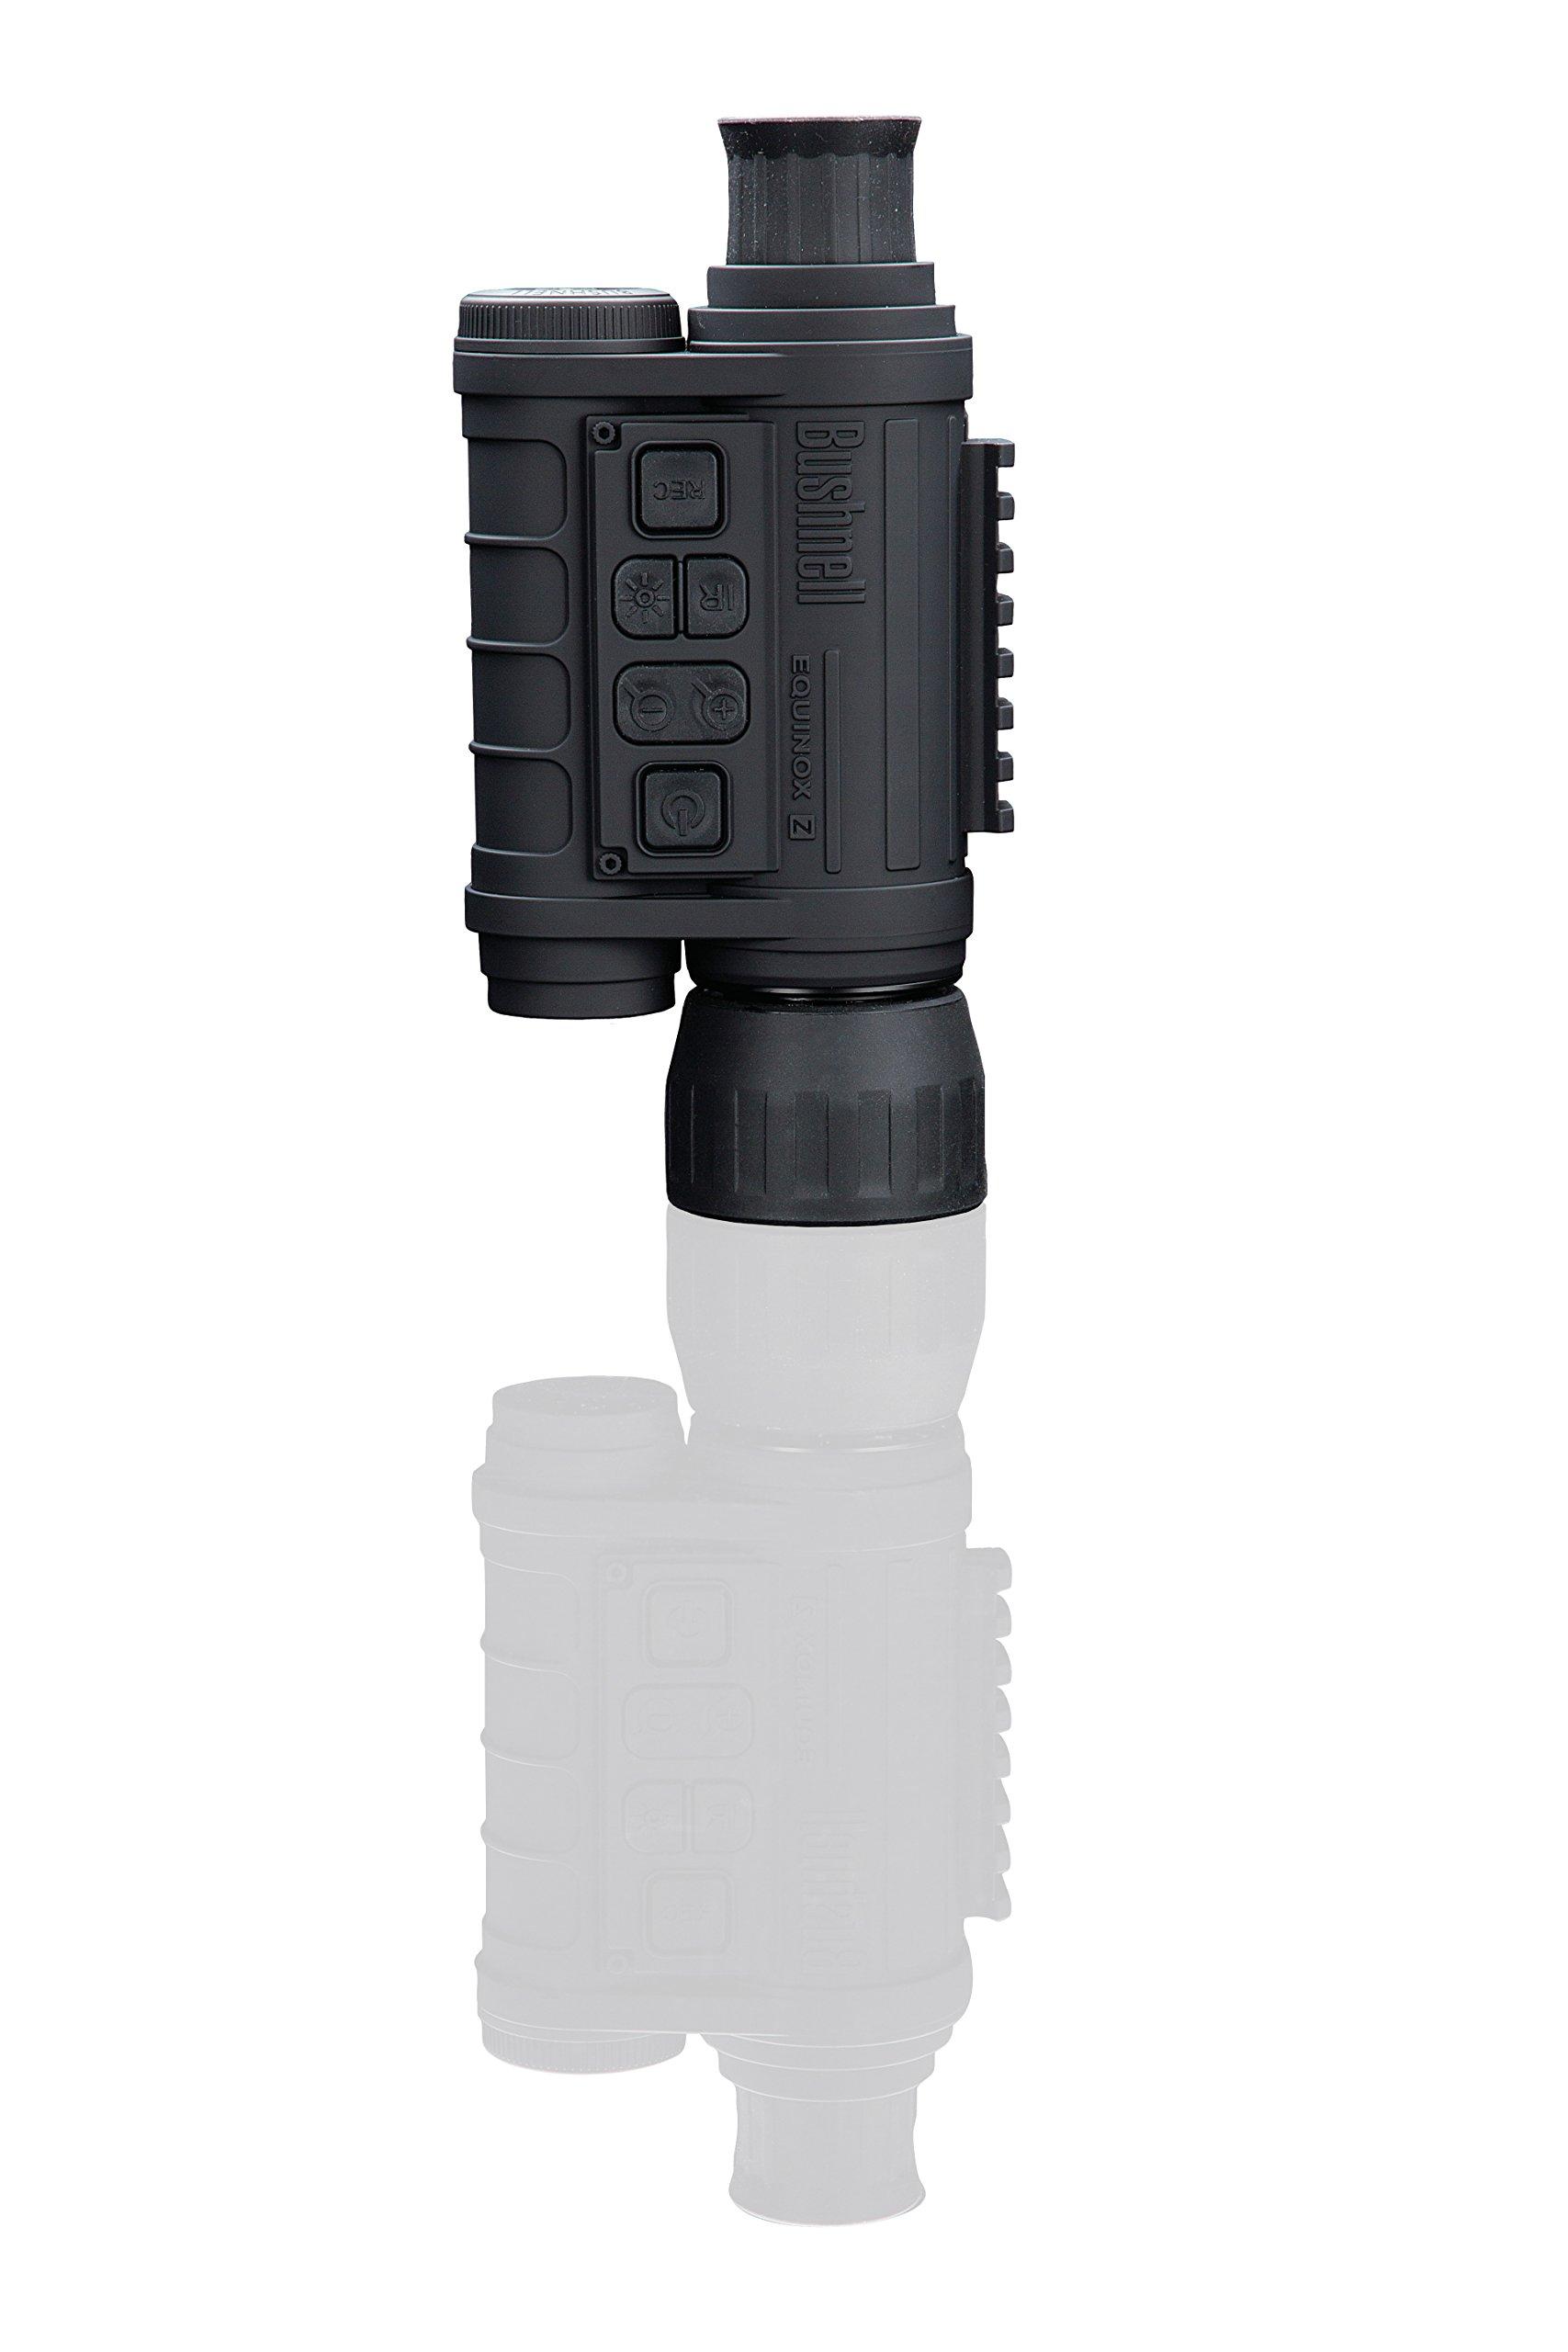 Bushnell Equinox Z Digital Night Vision Monocular, 3 x 30mm by Bushnell (Image #2)